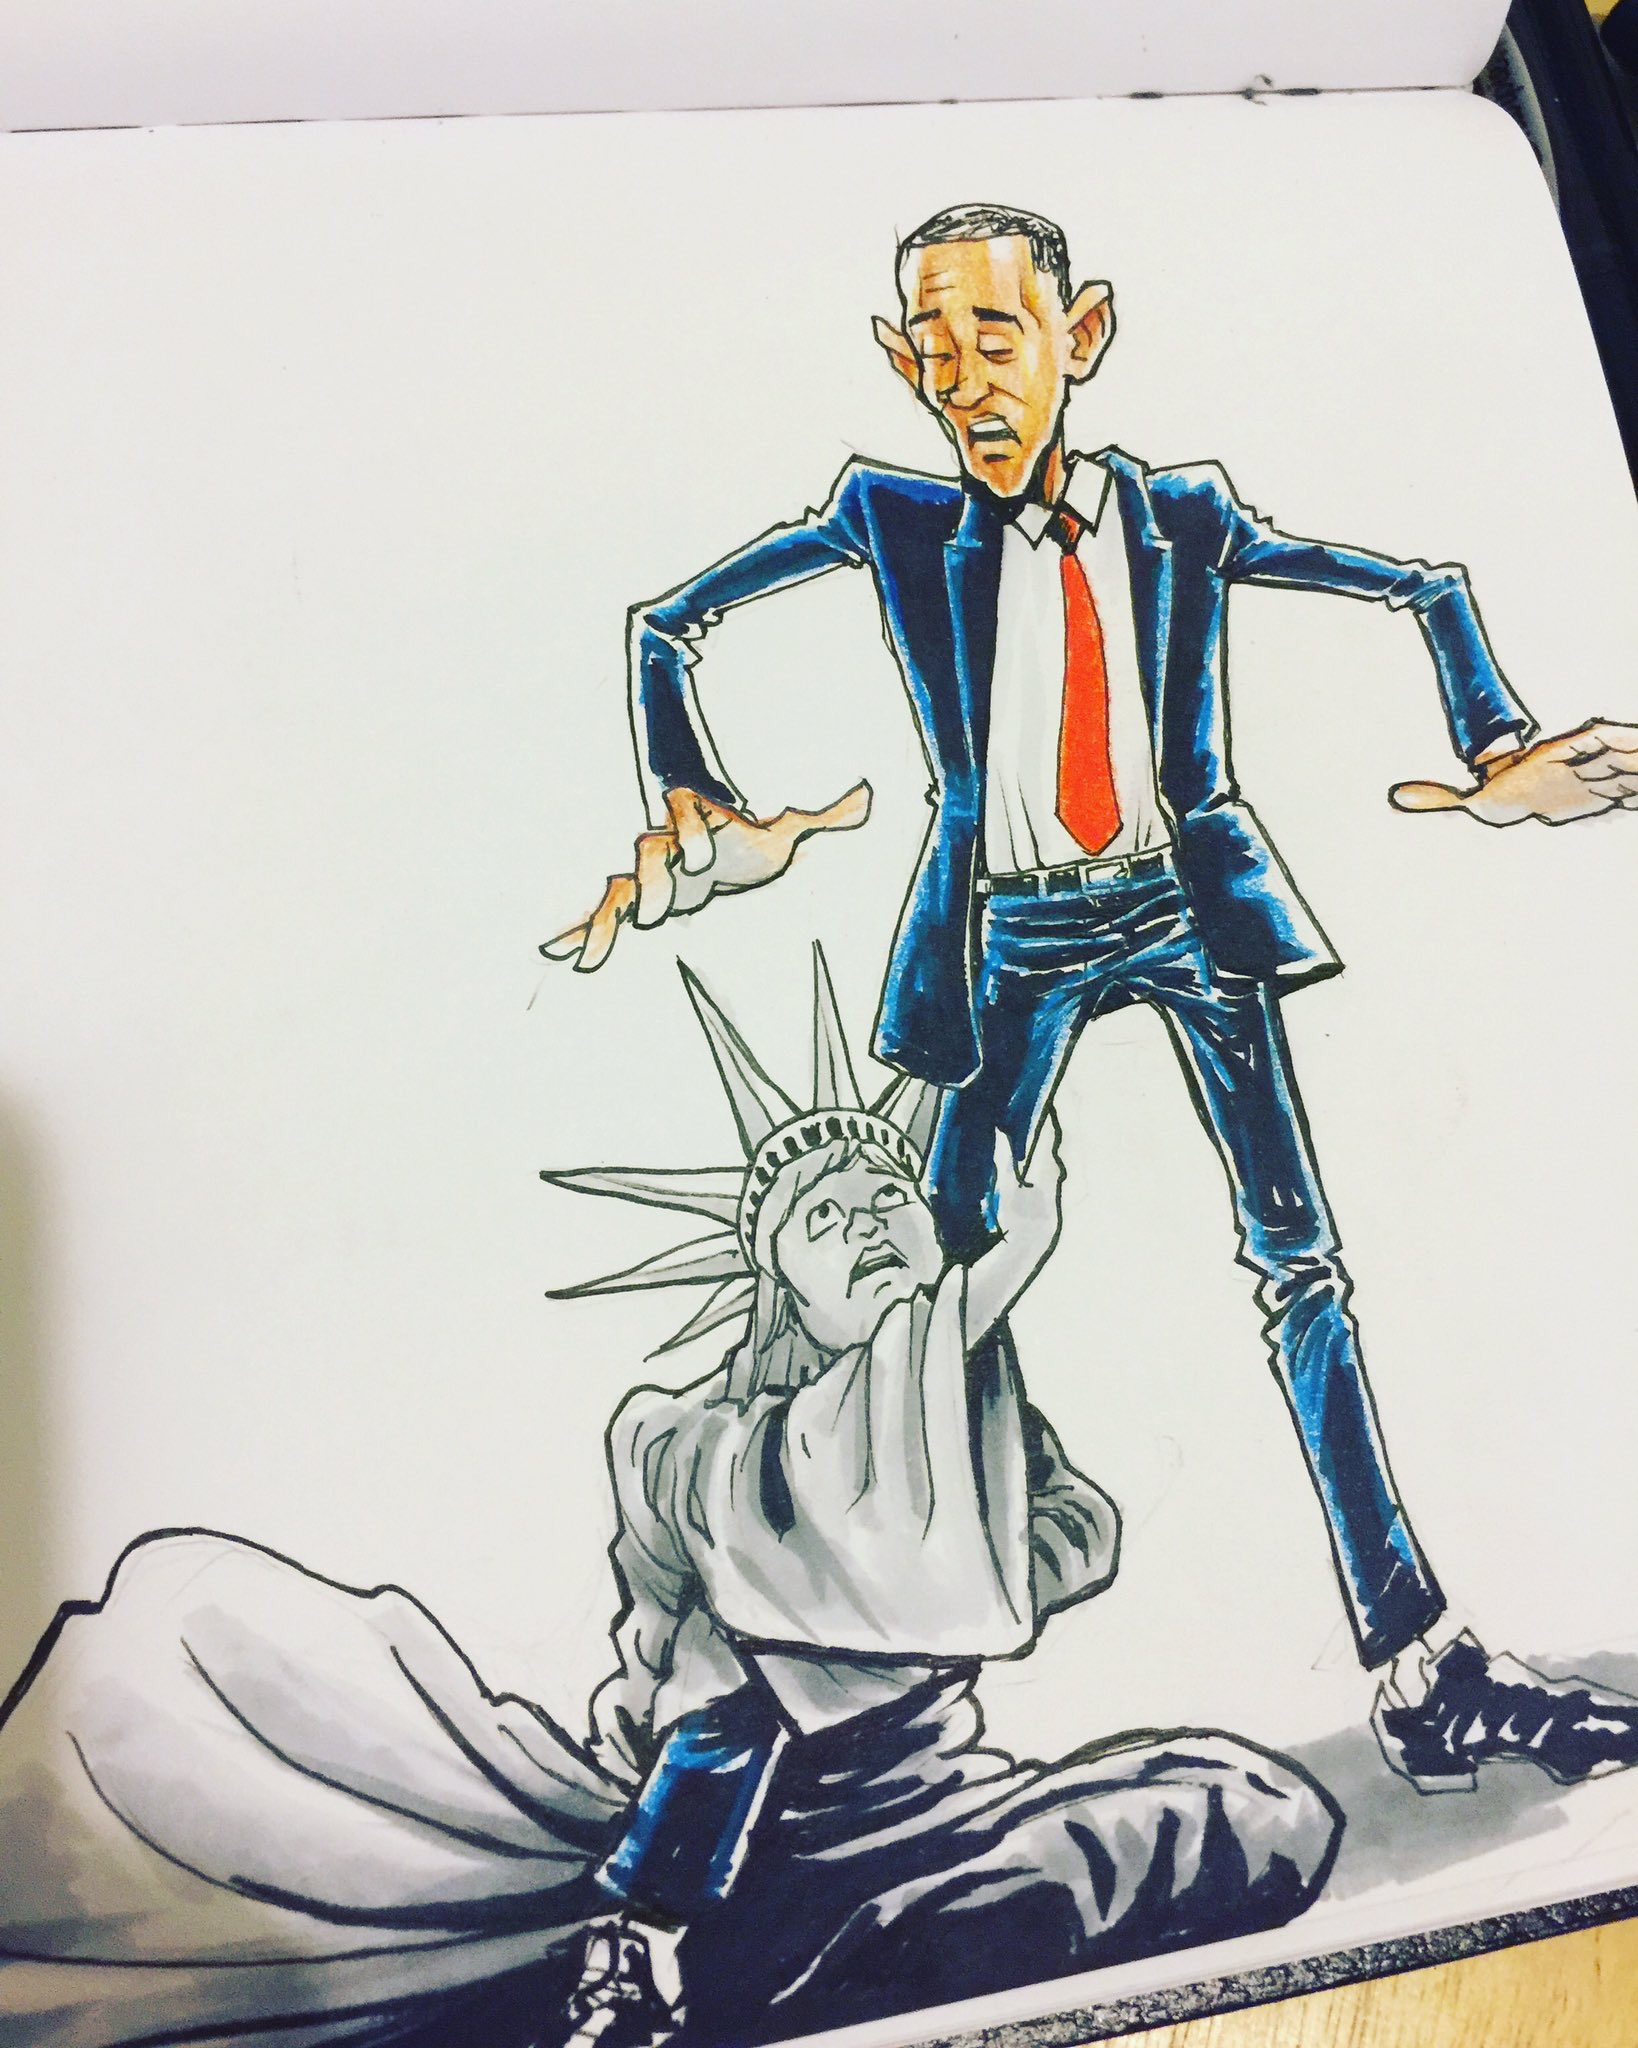 Mood. #ObamaFarewell https://t.co/ycNsGbnk3R